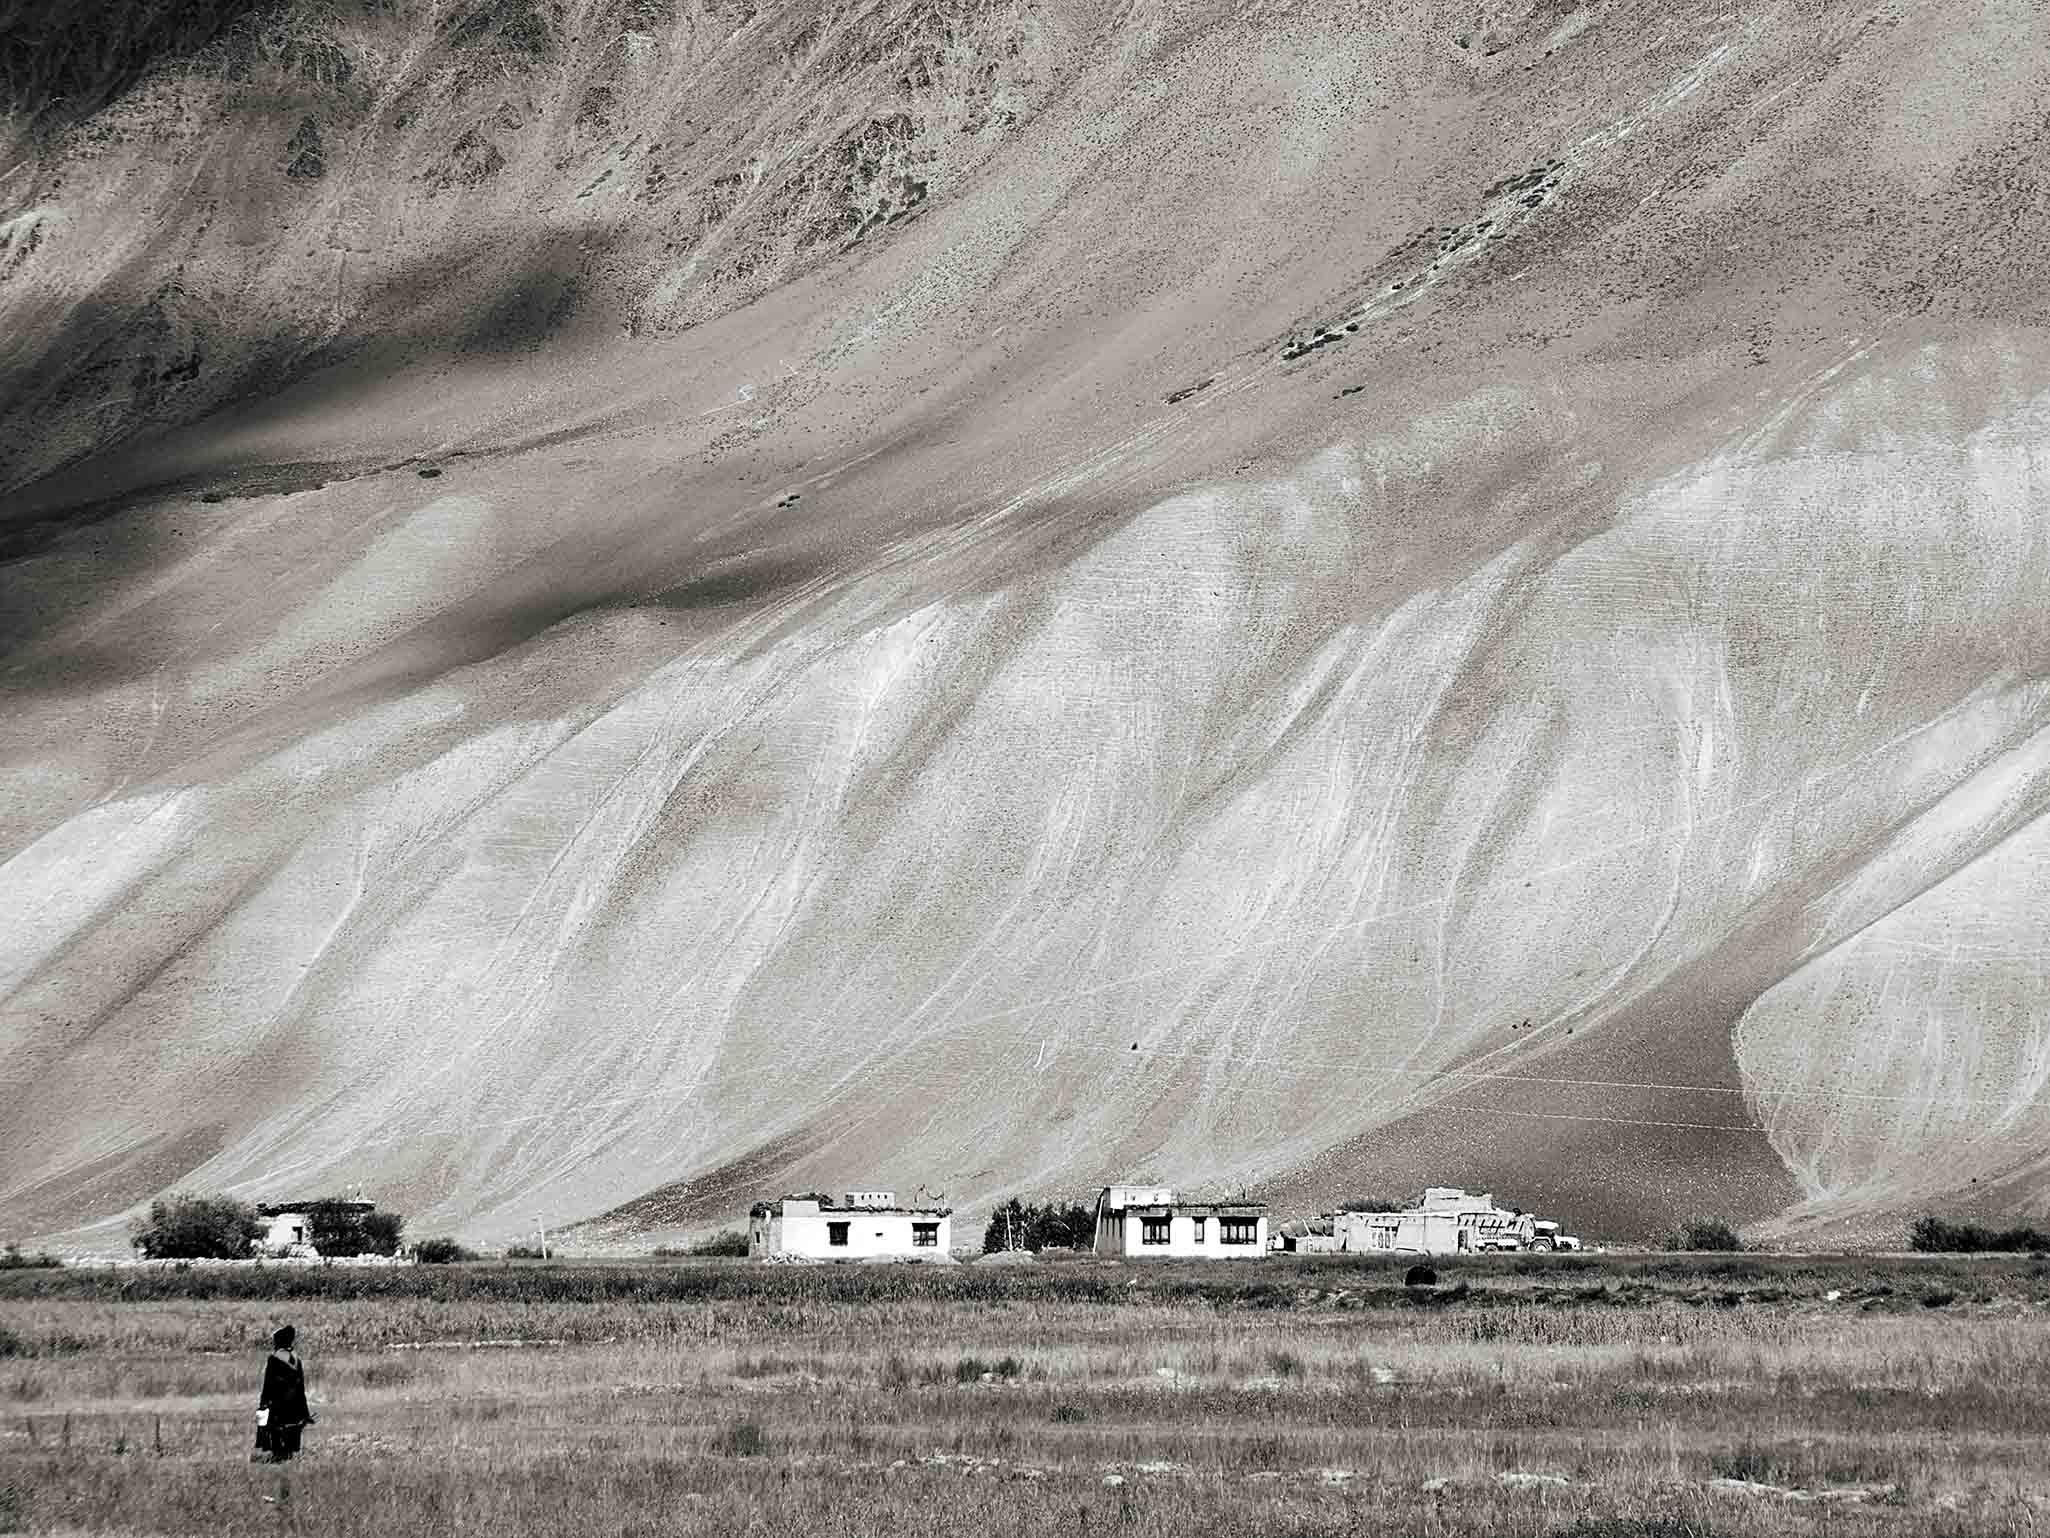 Padum Ladakh 3.6.5 DSC_0557